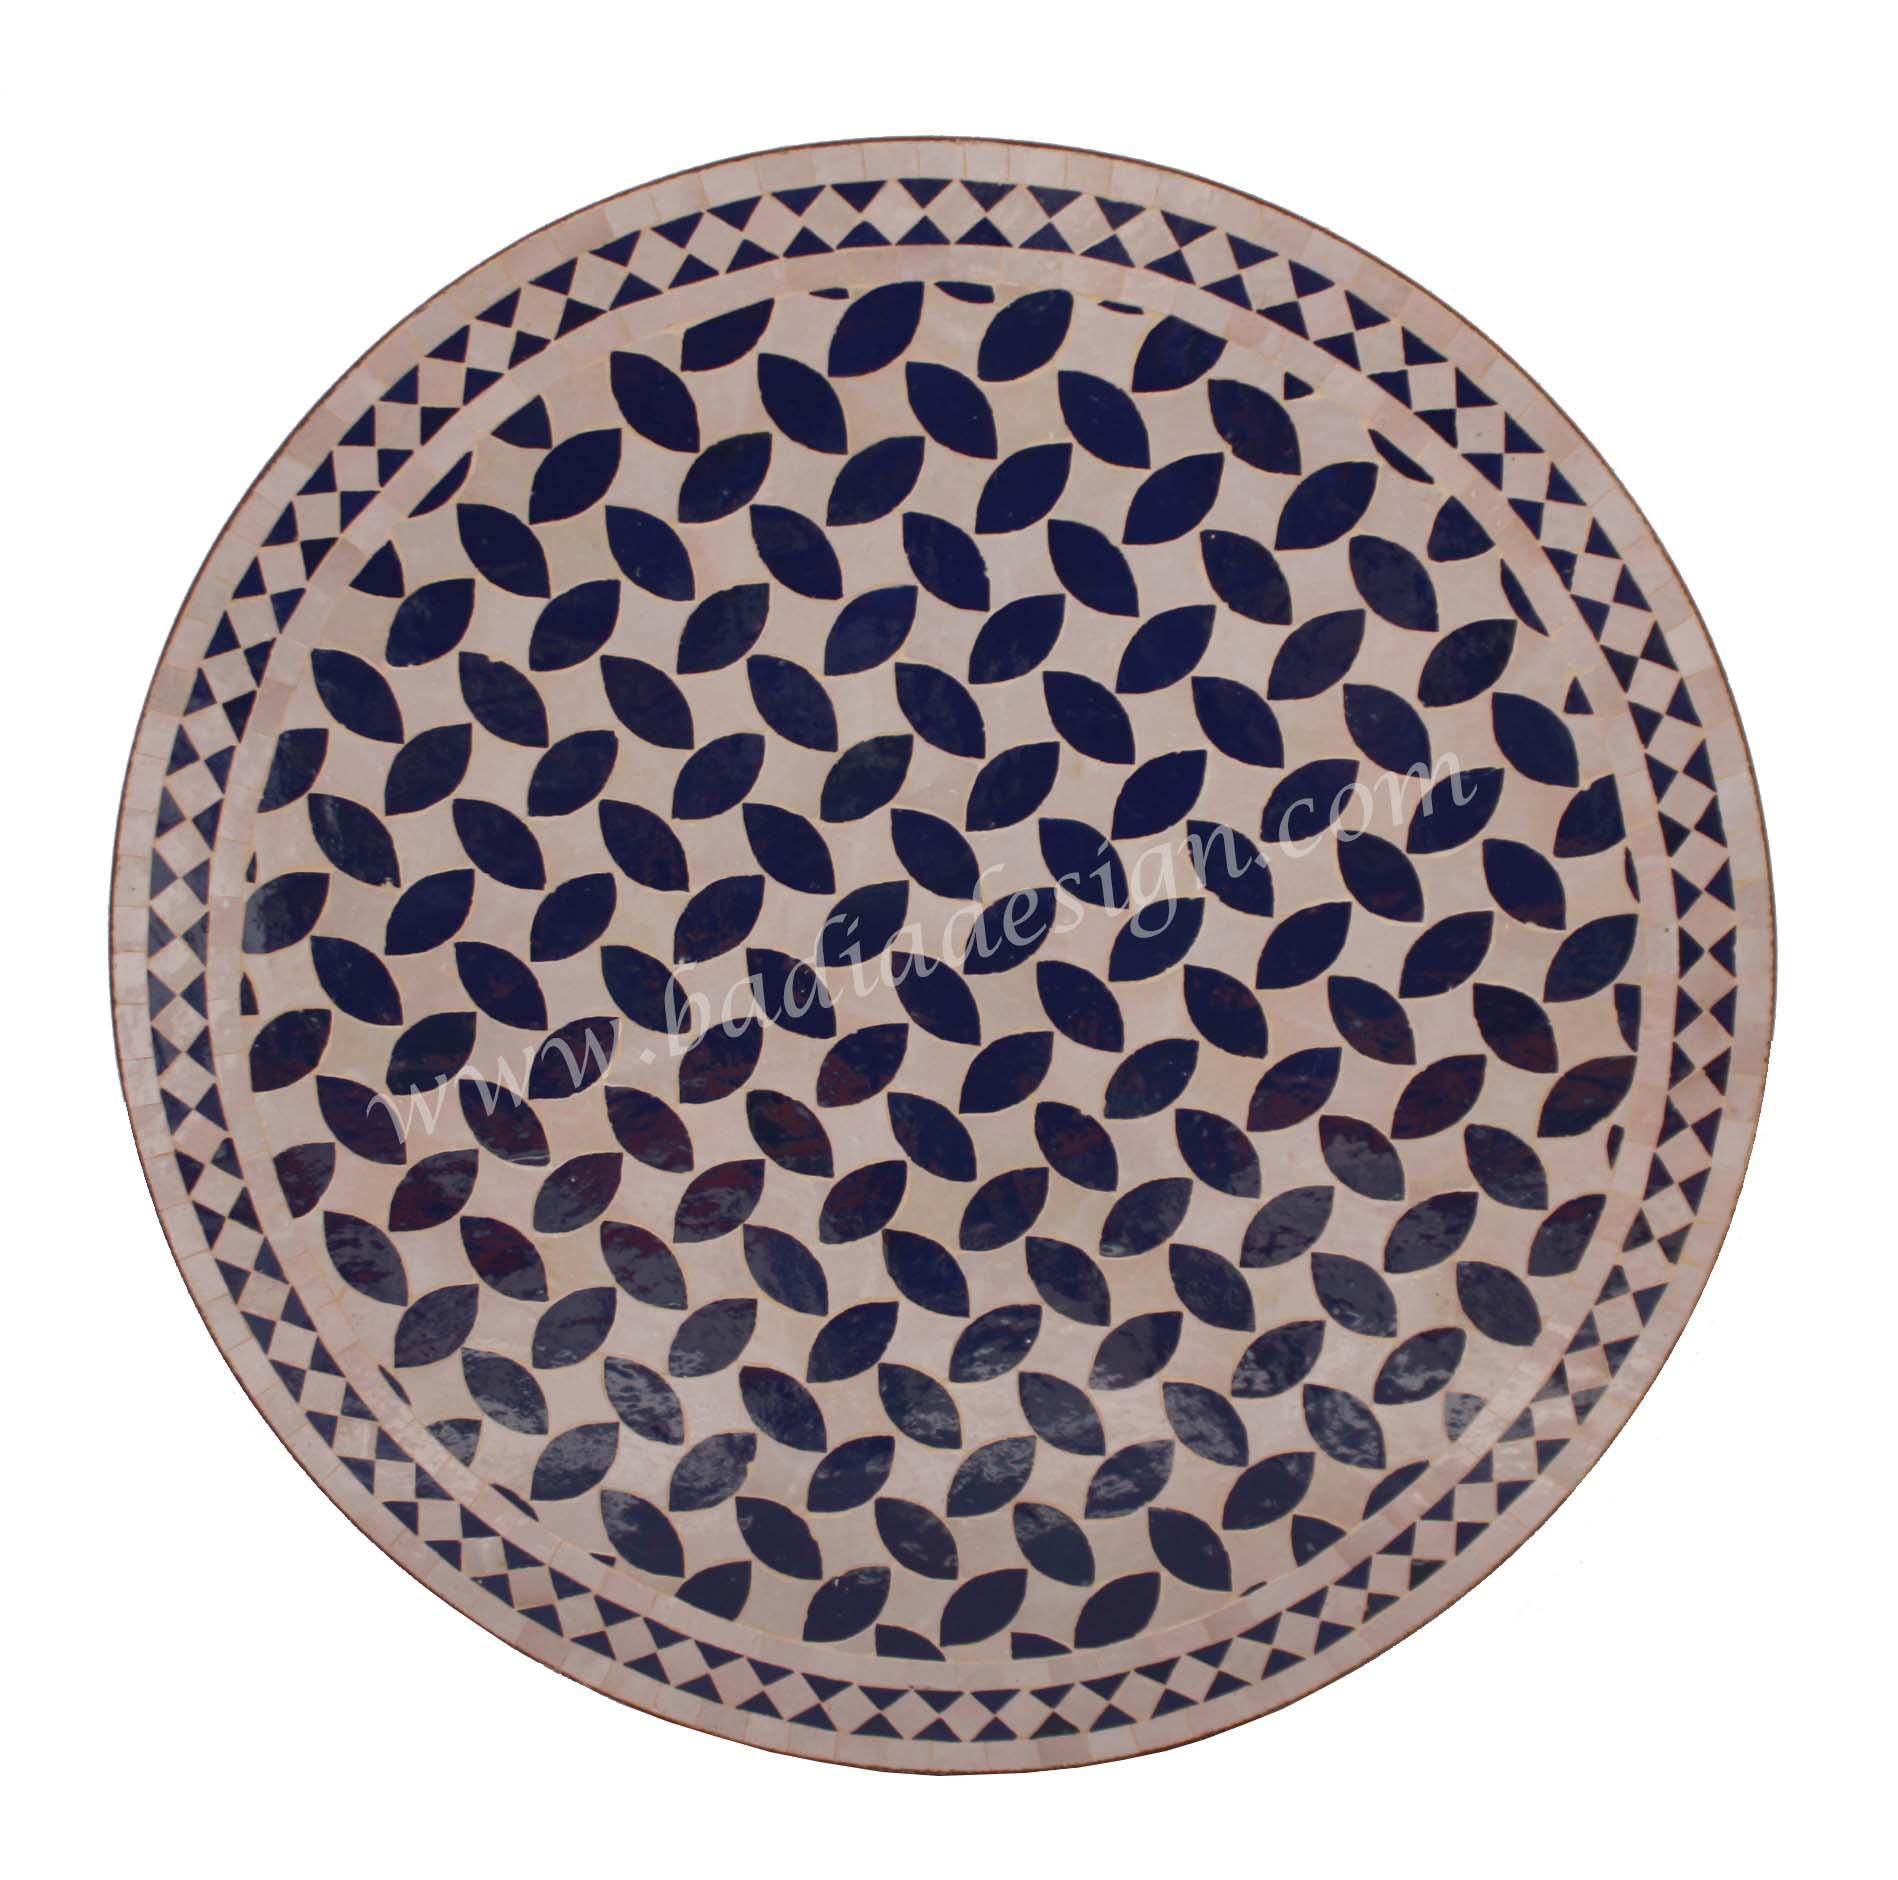 moroccan-tile-tables-los-angeles-mtr248.jpg